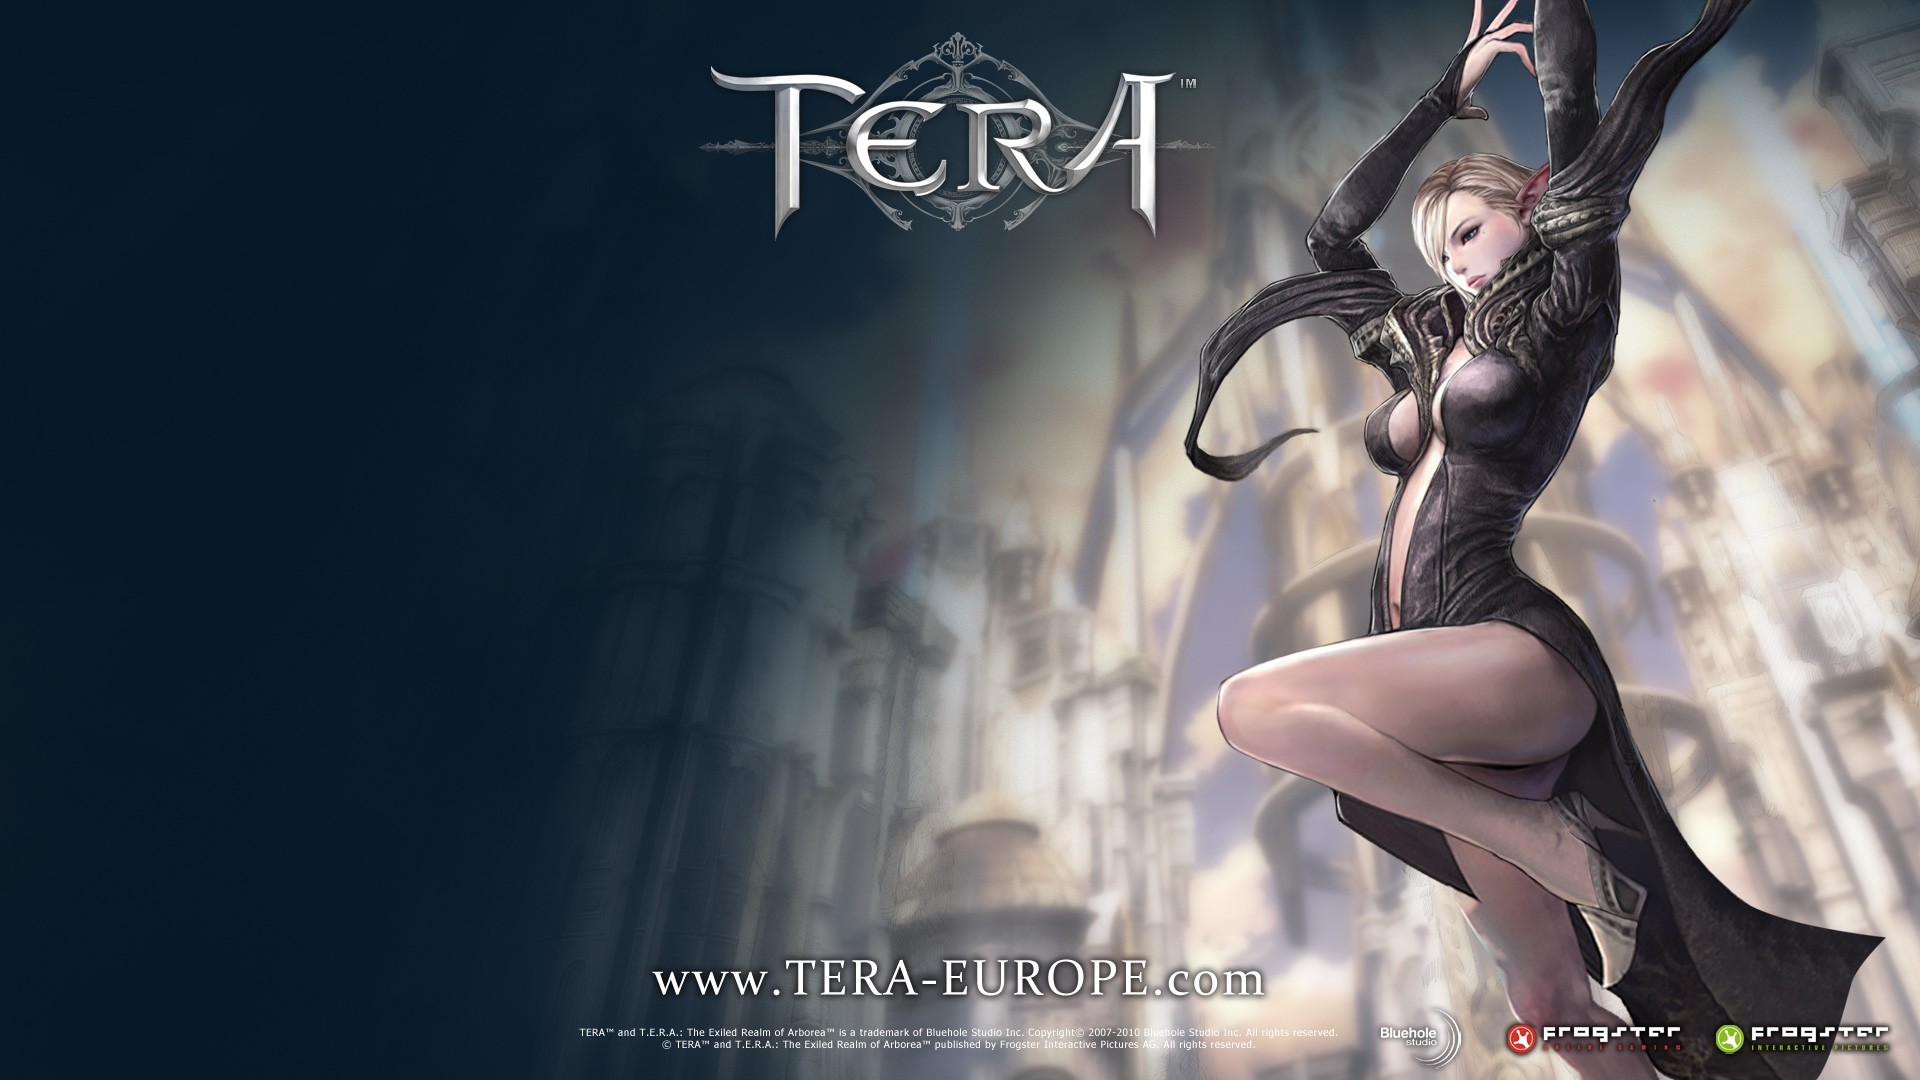 Download Tera Online Wallpaper